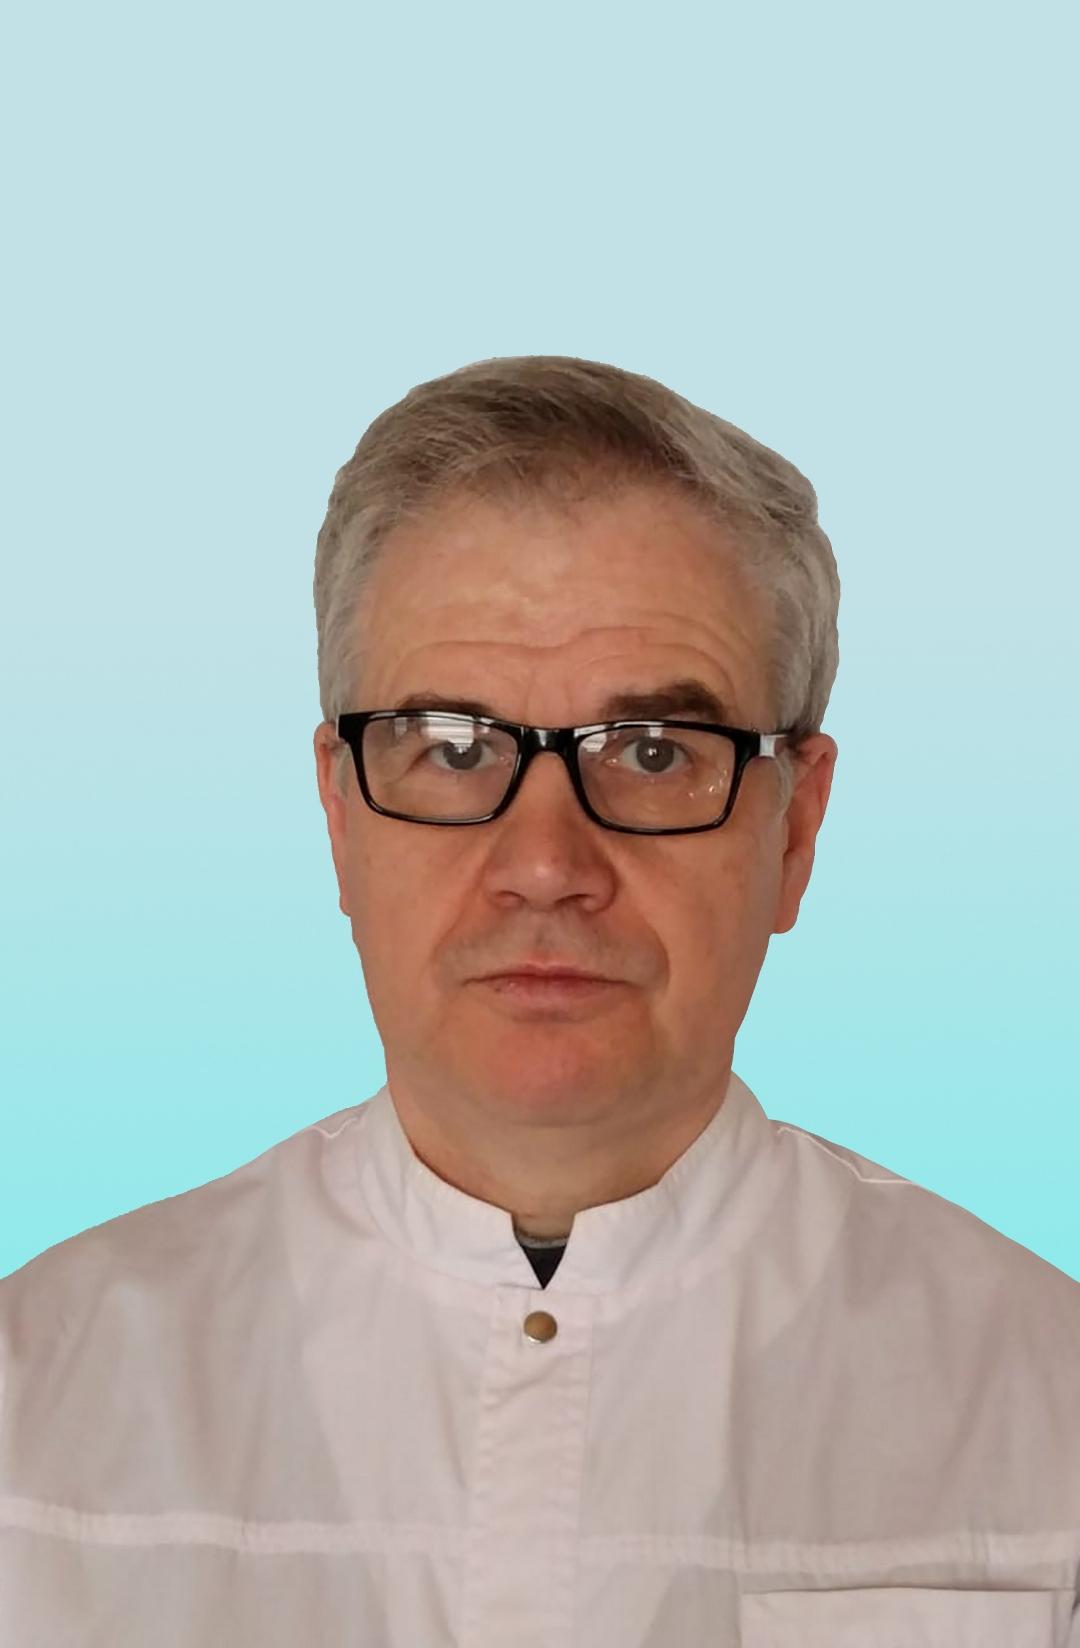 Врач-хирург эндокринолог Щербаков Сергей Анатольевич